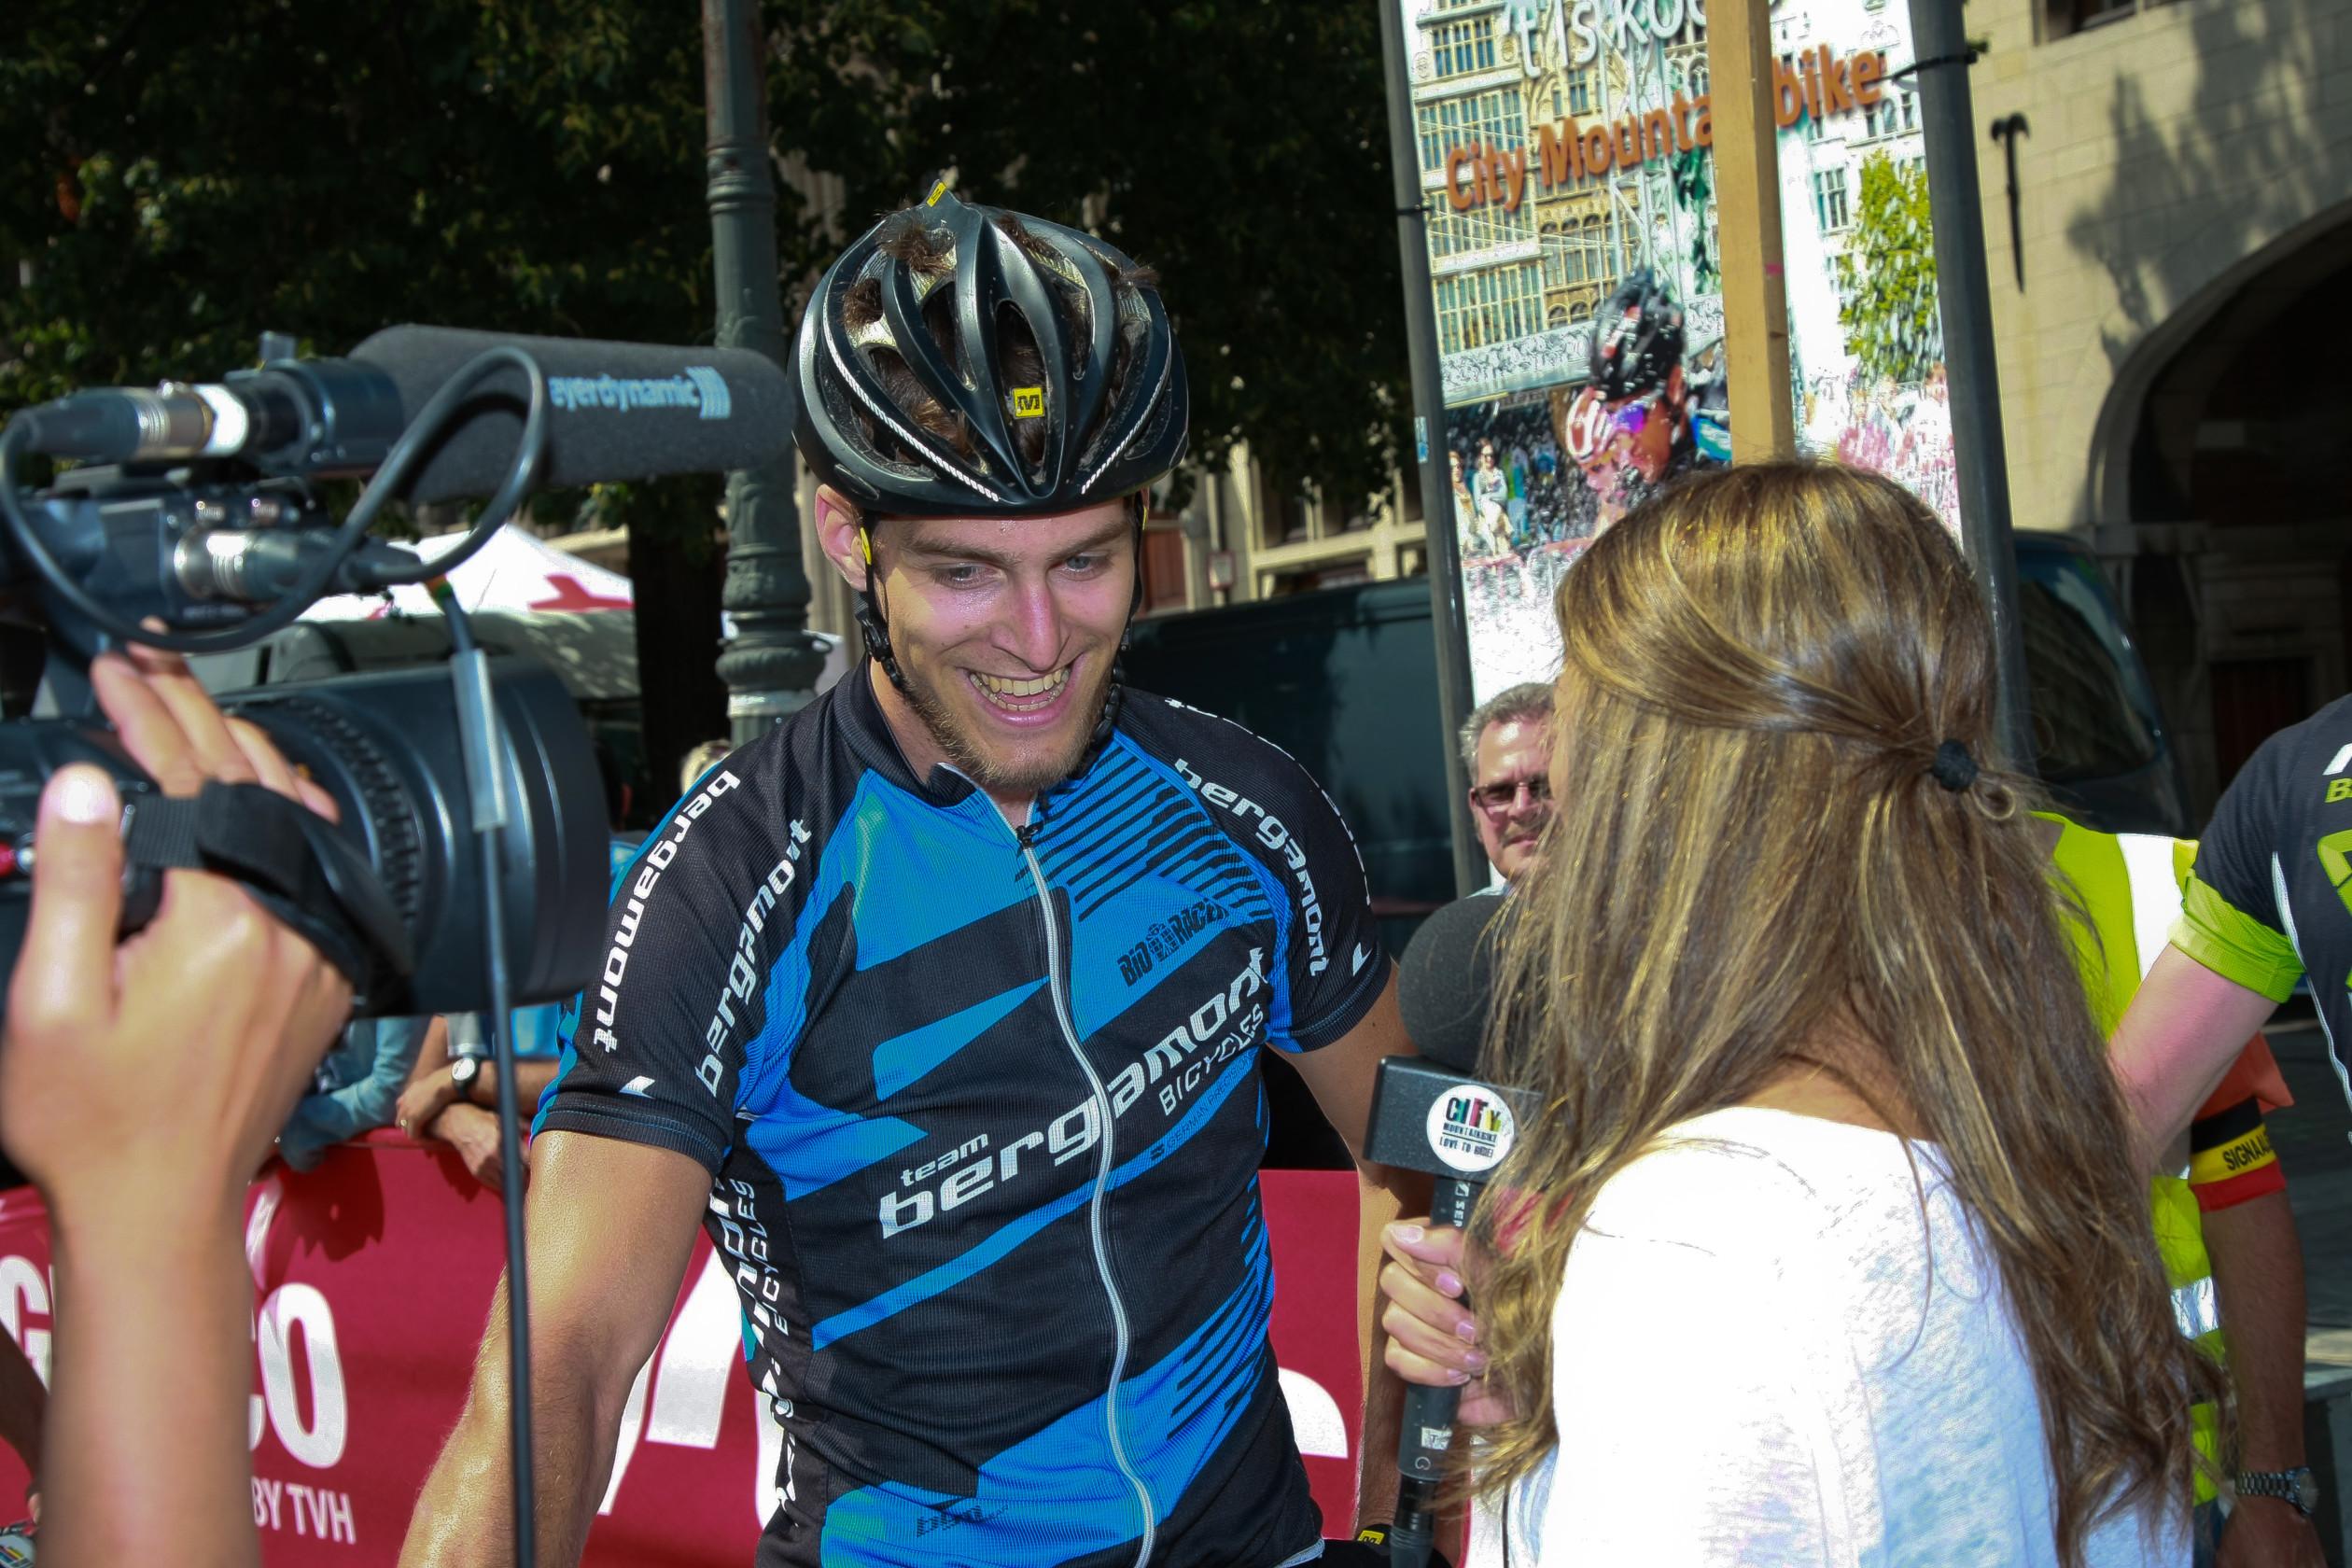 City MTB – UCI Eliminator 300 DPIAntwerpen 2014GLPE160614 23